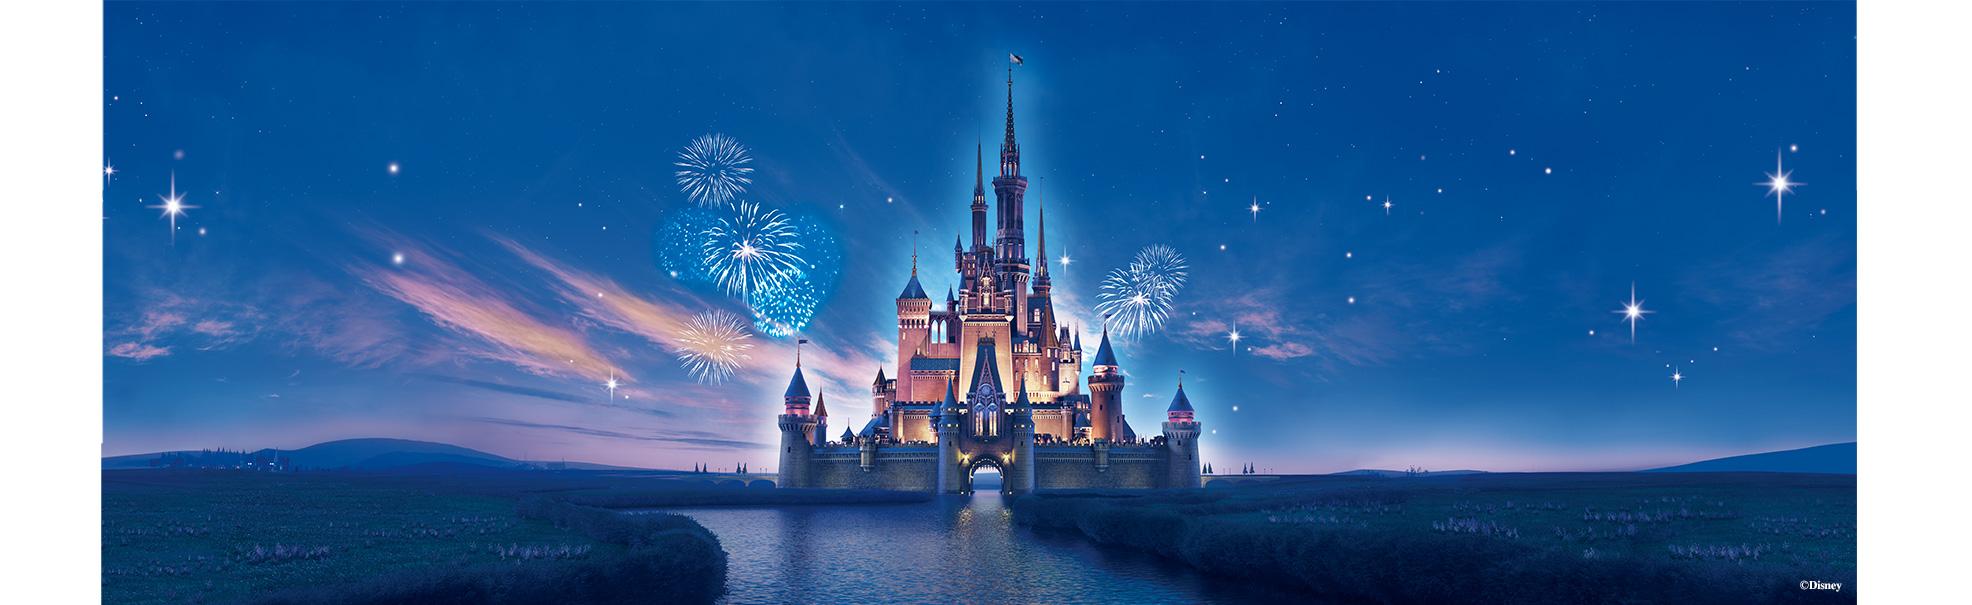 Brandwall_Disney_k